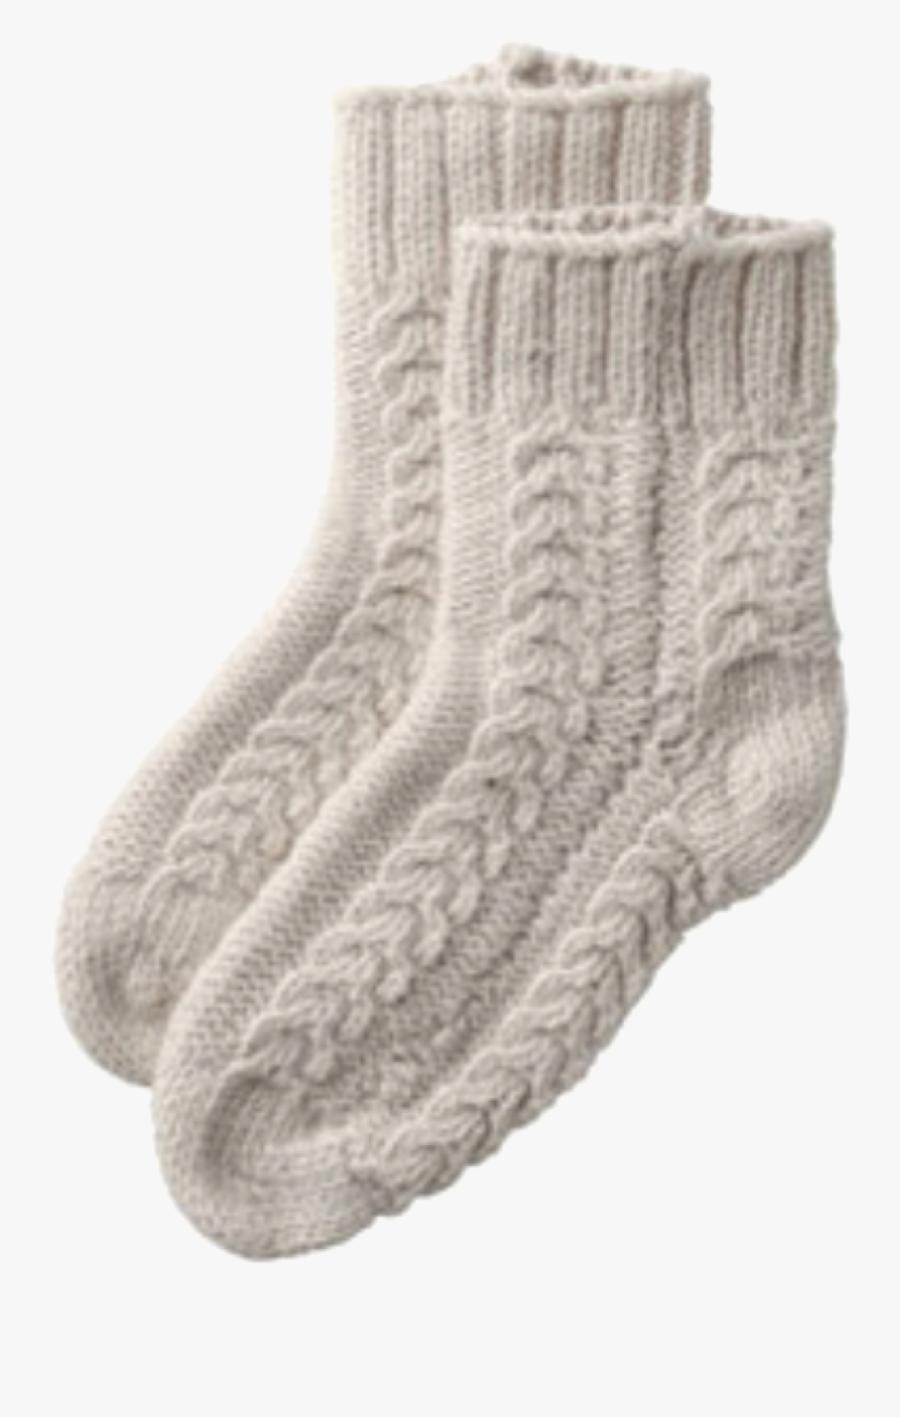 Transparent Fuzzy Socks Clipart.